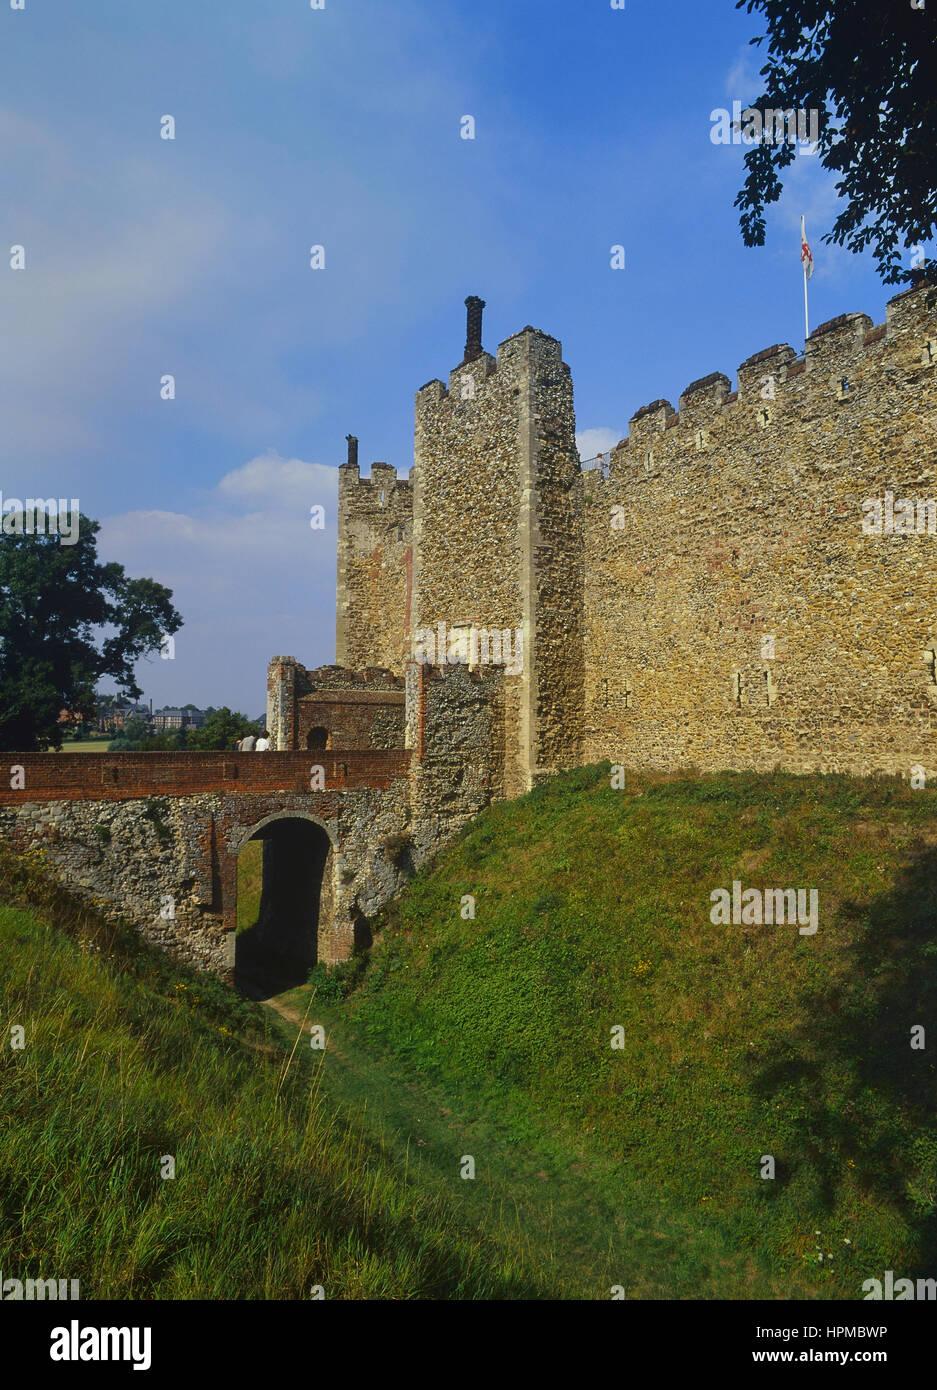 The entrance and moat at Framlingham Castle. Suffolk. England. UK - Stock Image